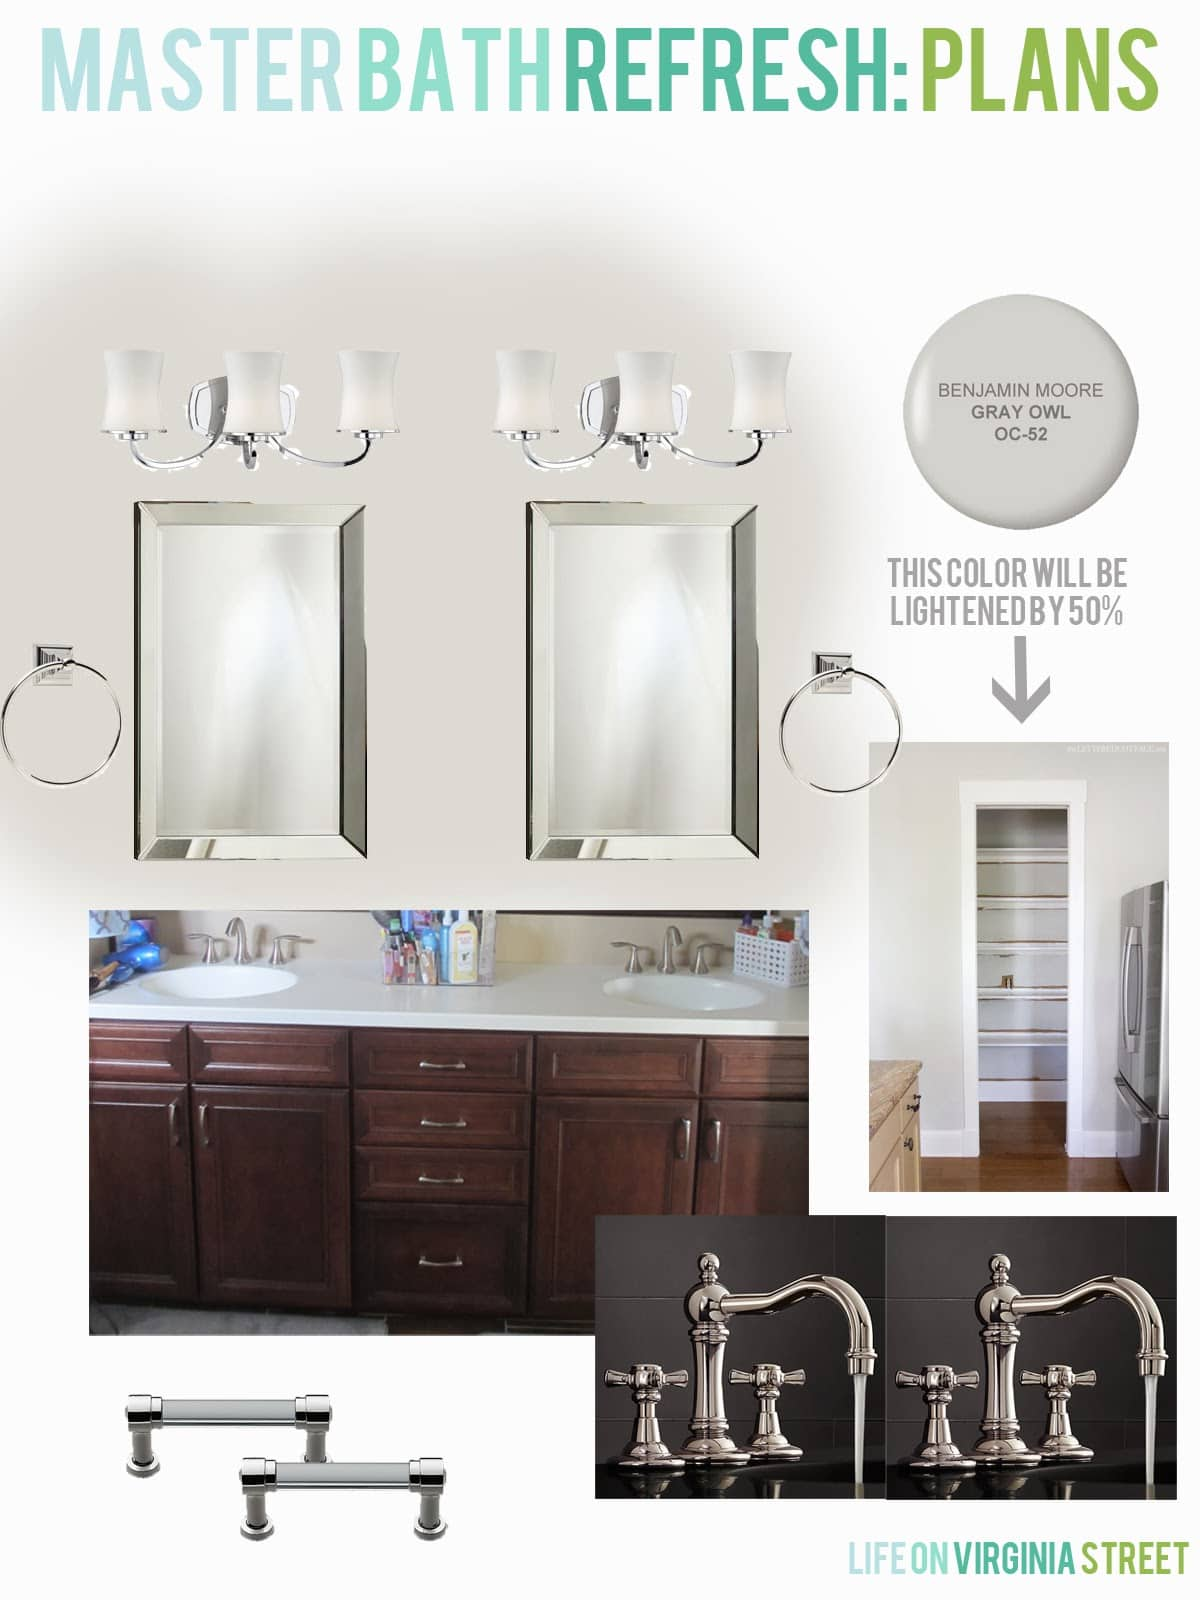 Master Bathroom Design Checklist | Life On Virginia Street